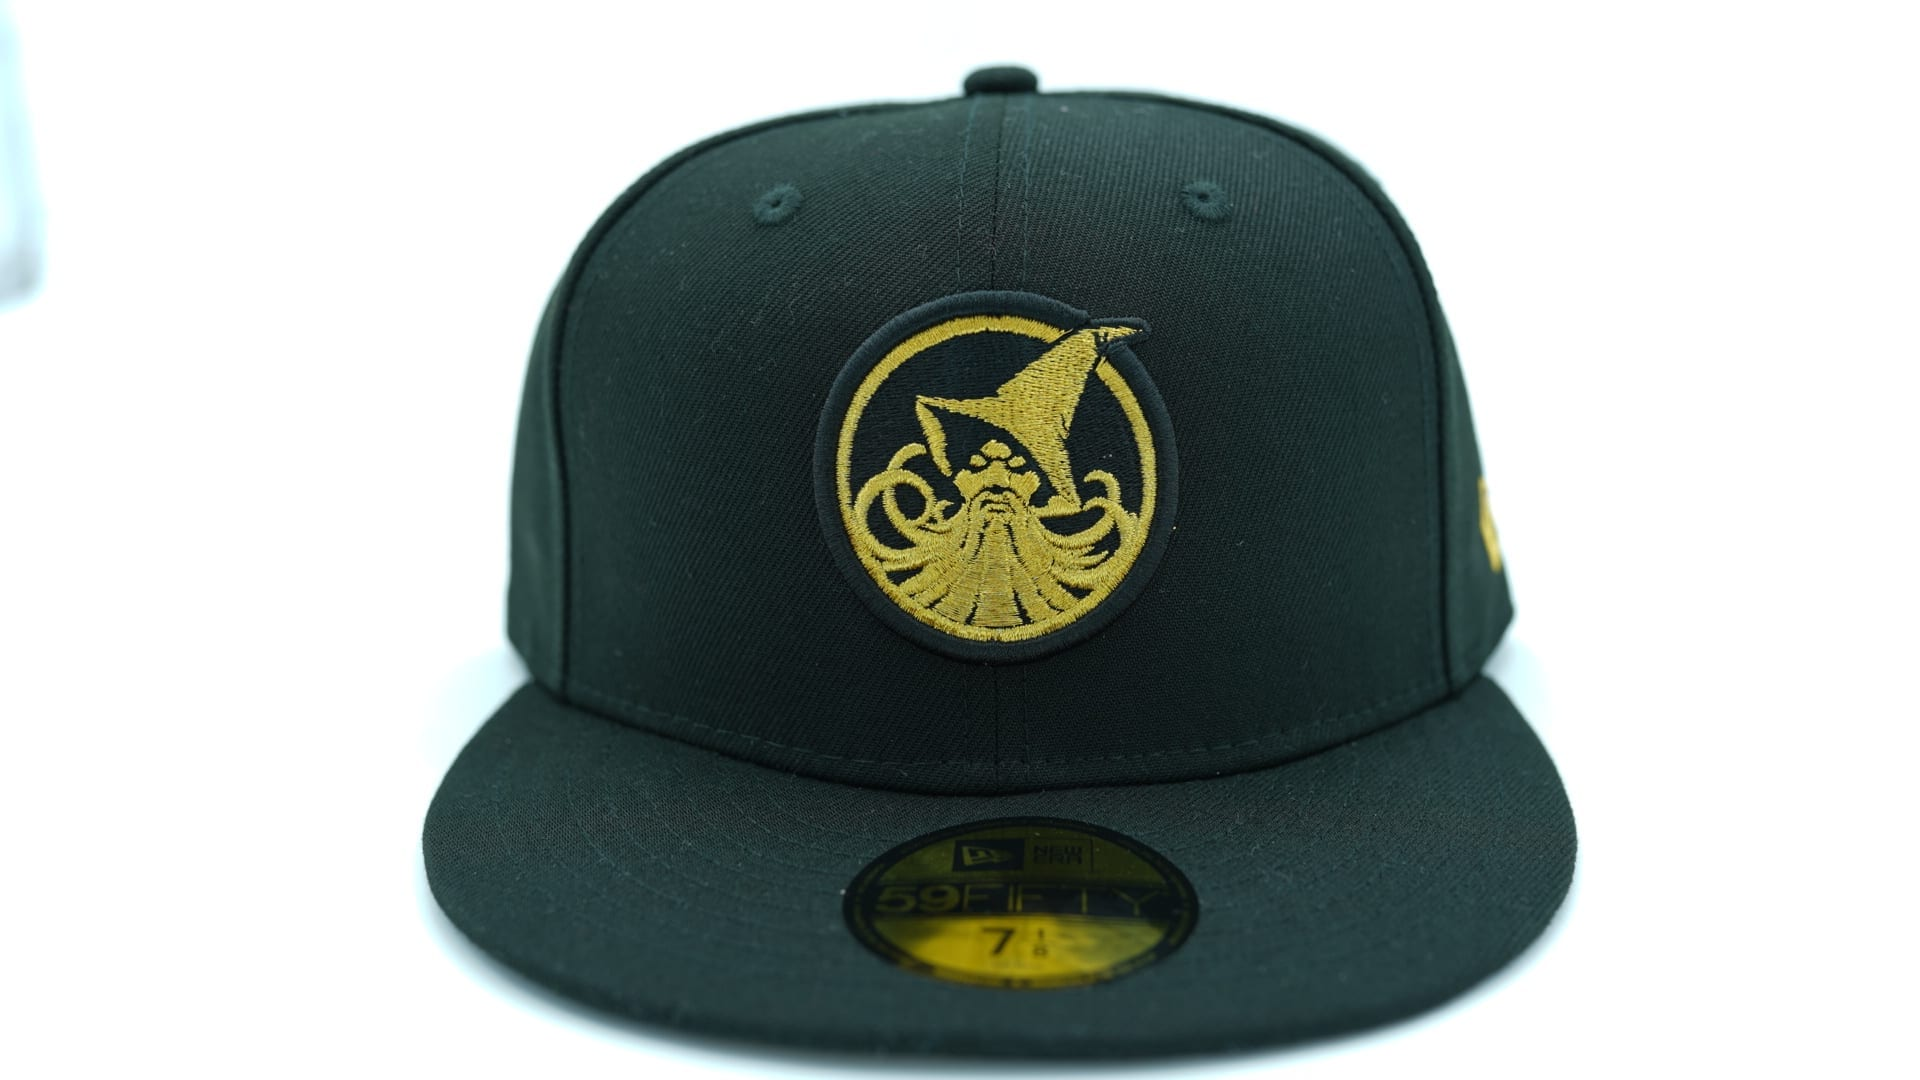 2d023e0fdc3 ... snapback 7b325 45139  sale chicago bulls ballpeak 59fifty fitted  baseball cap new era nba 1 93154 be640